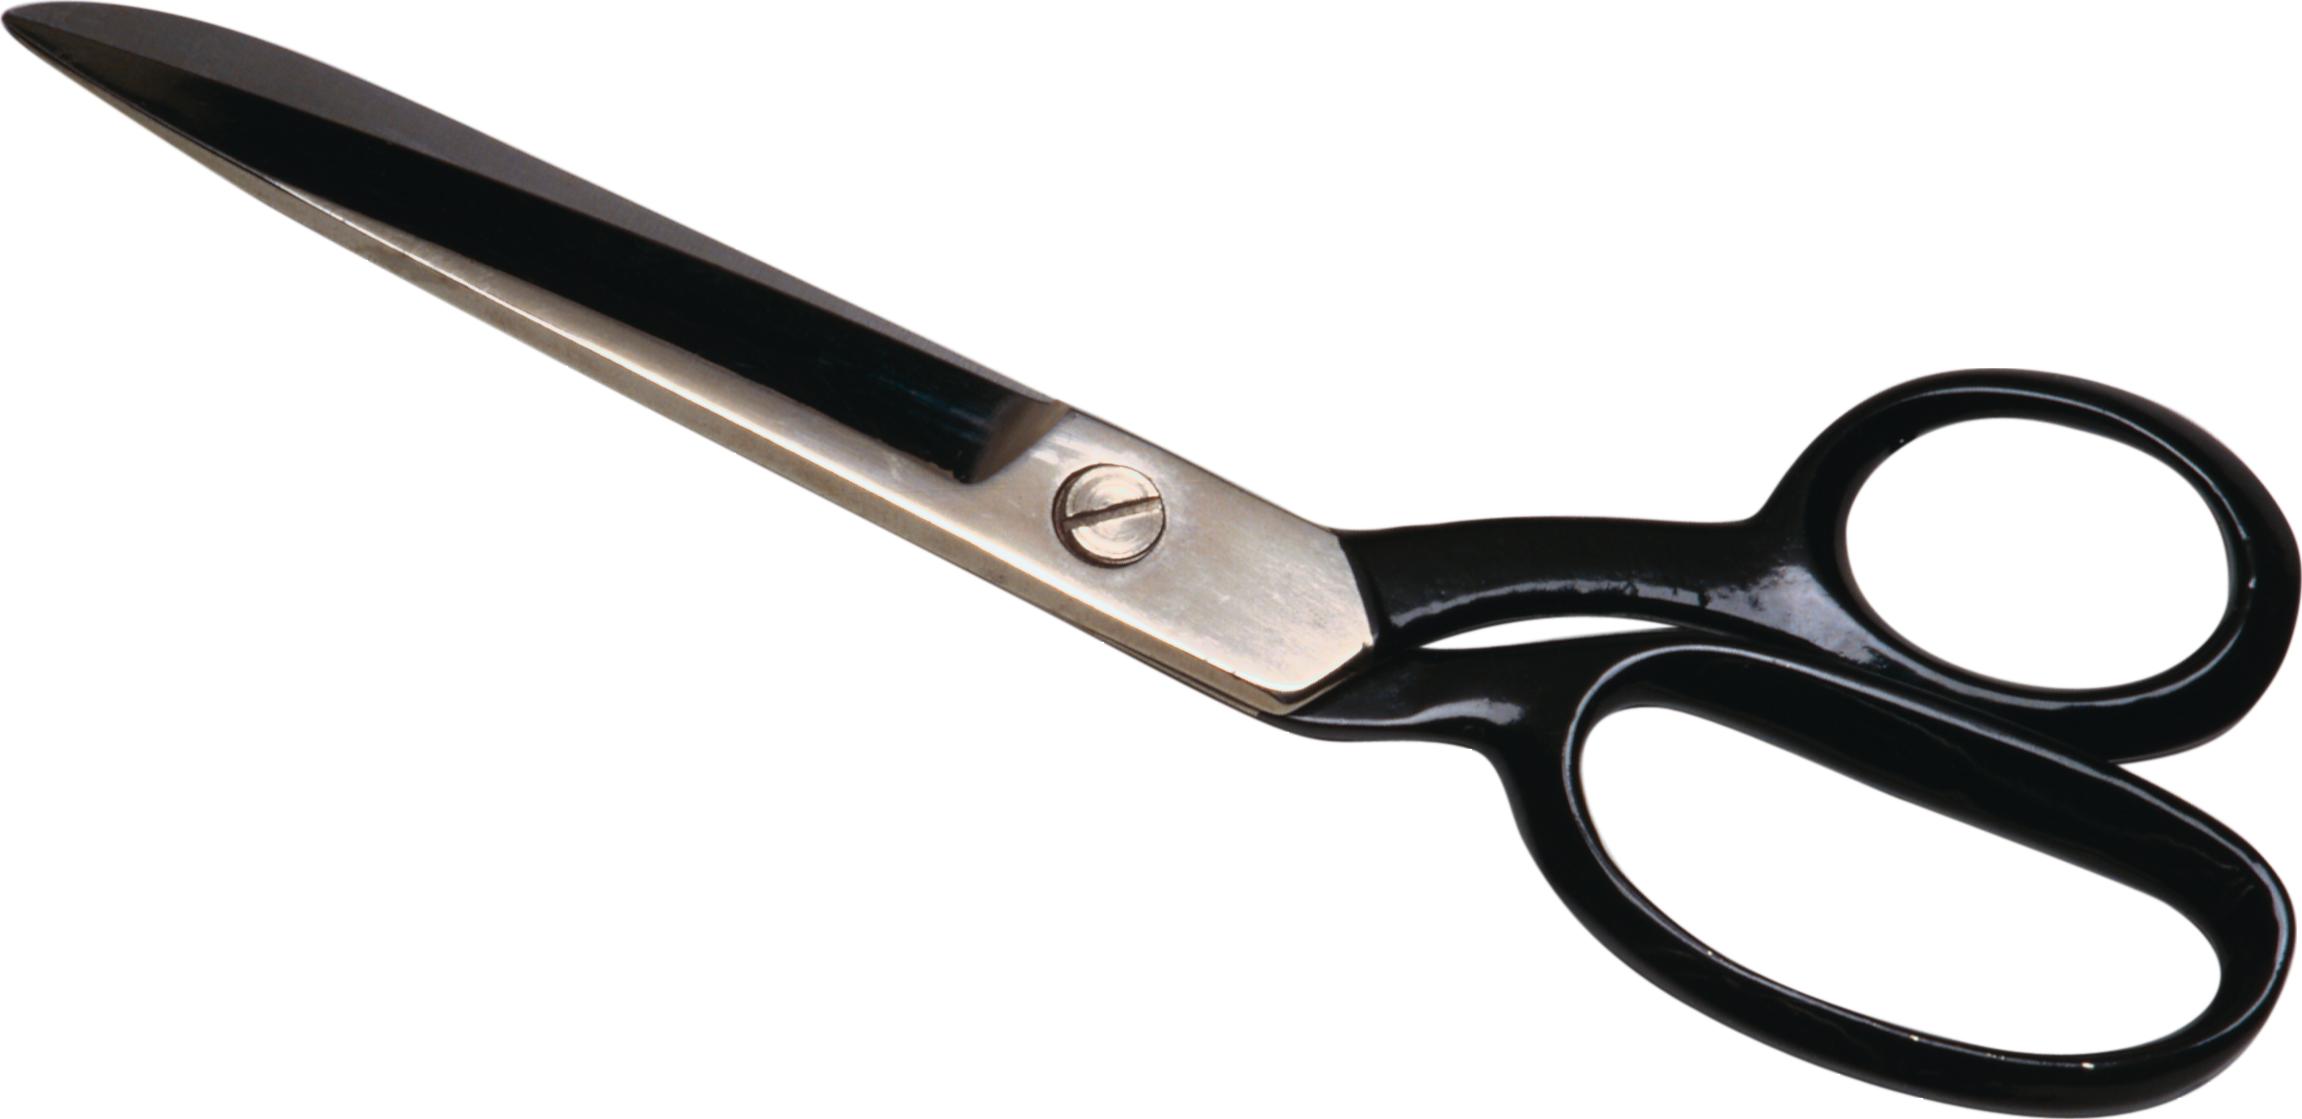 Scissors PNG - 16965